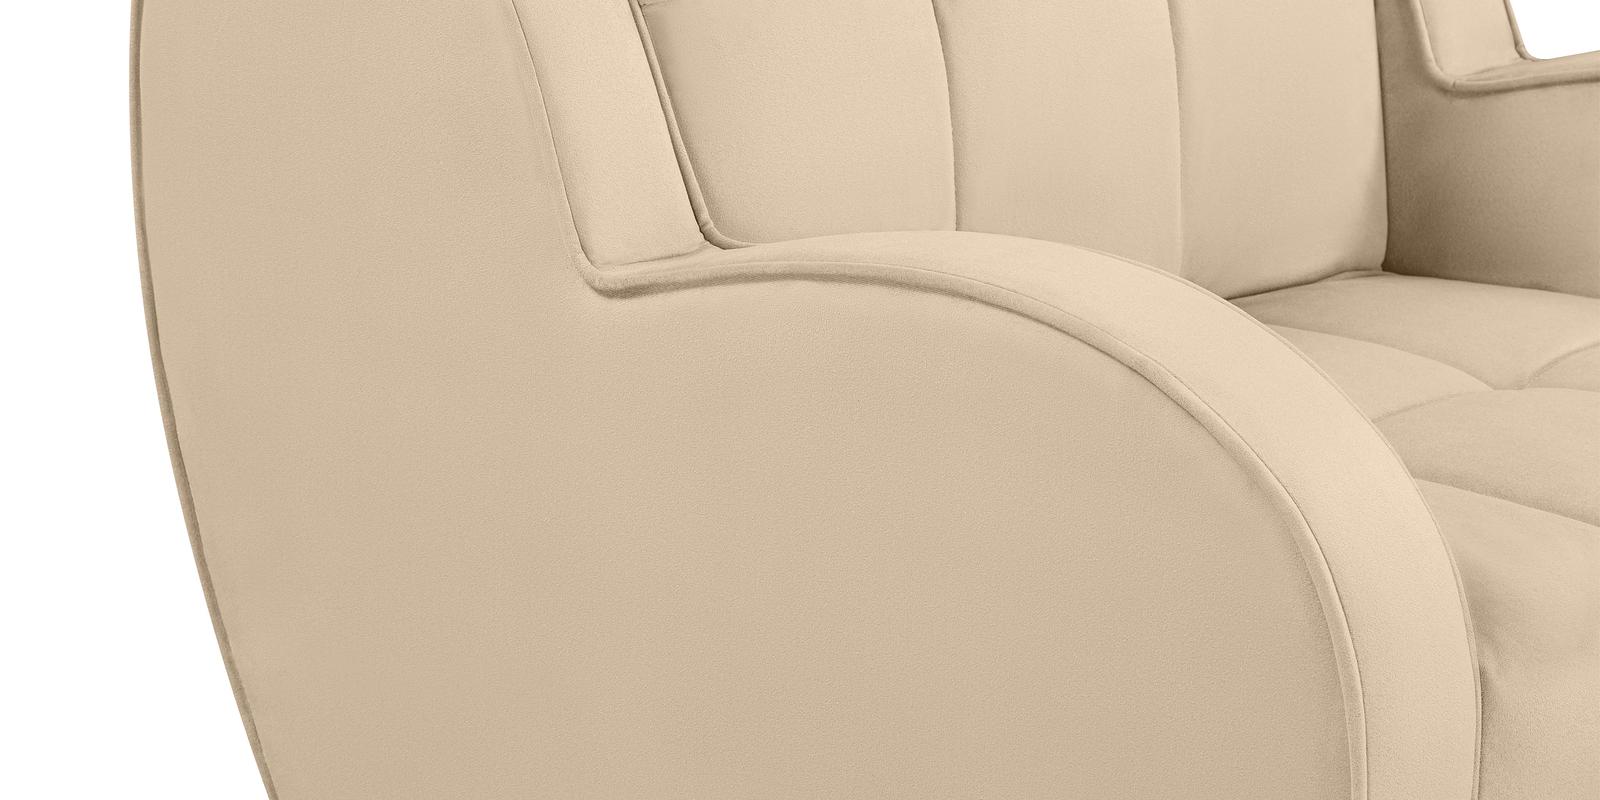 Кресло тканевое Барон Velure бежевый (Велюр) от HomeMe.ru